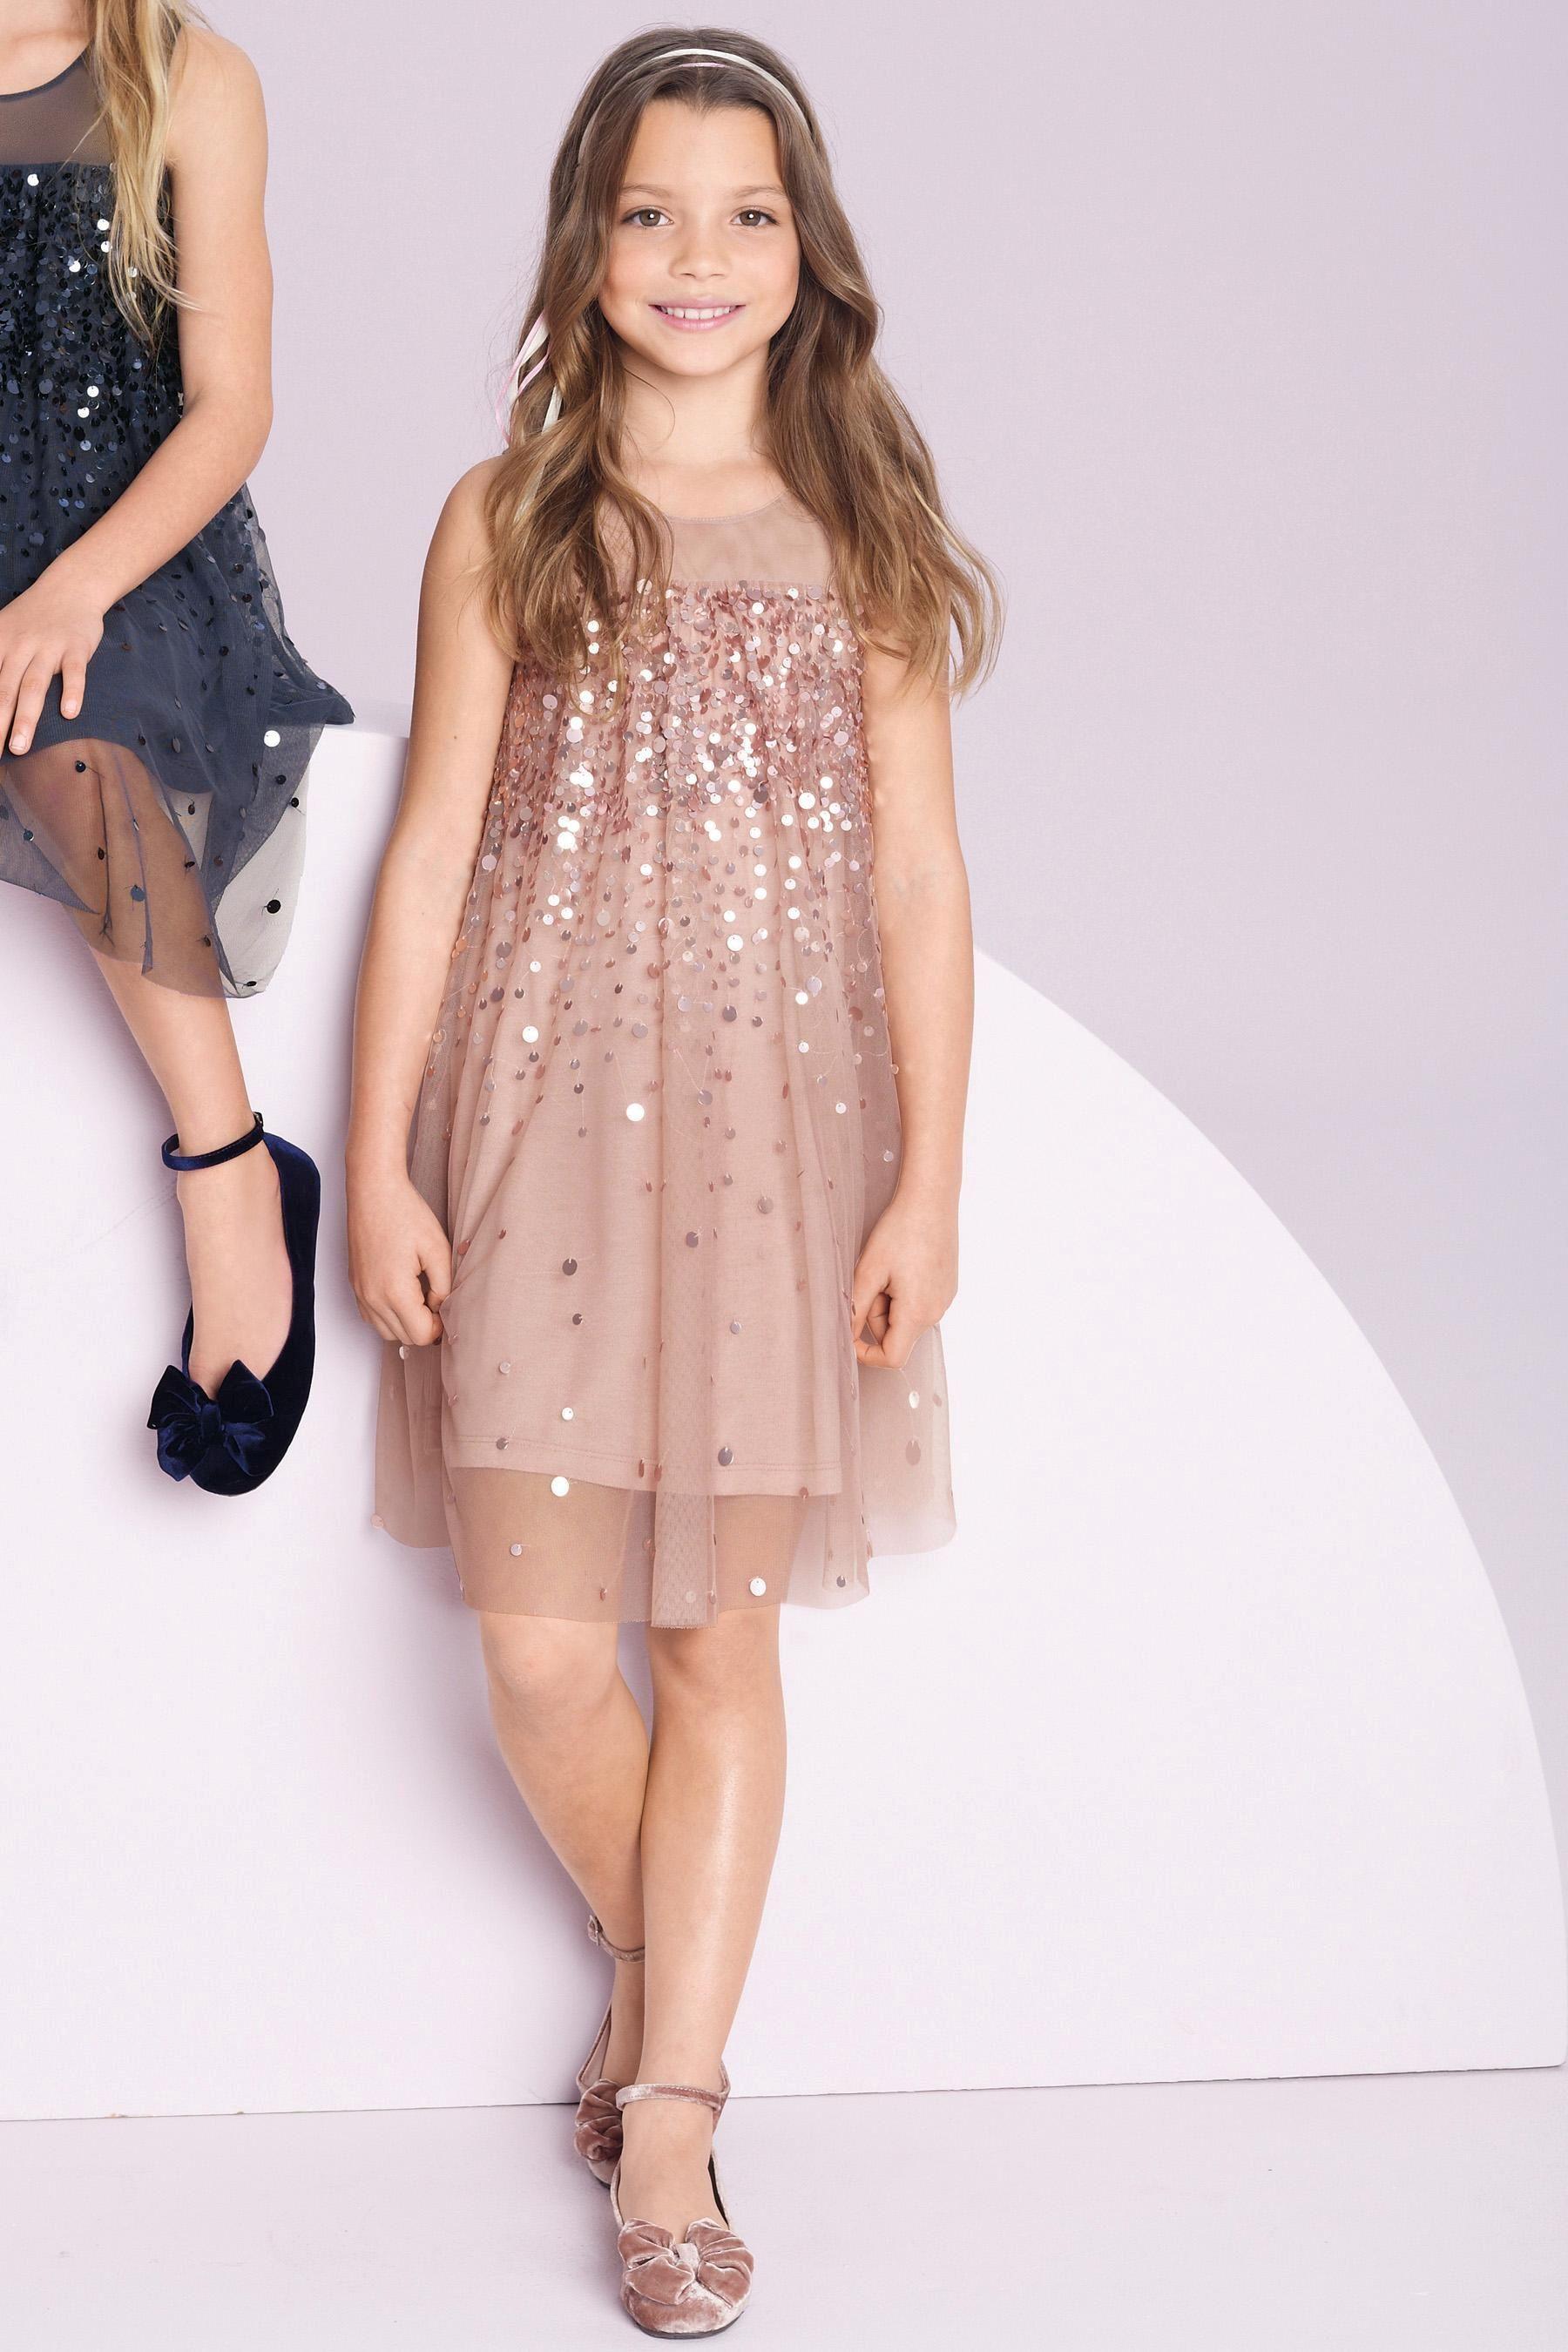 Moda para niños | Vestidos de noche | Pinterest | Moda para niños ...